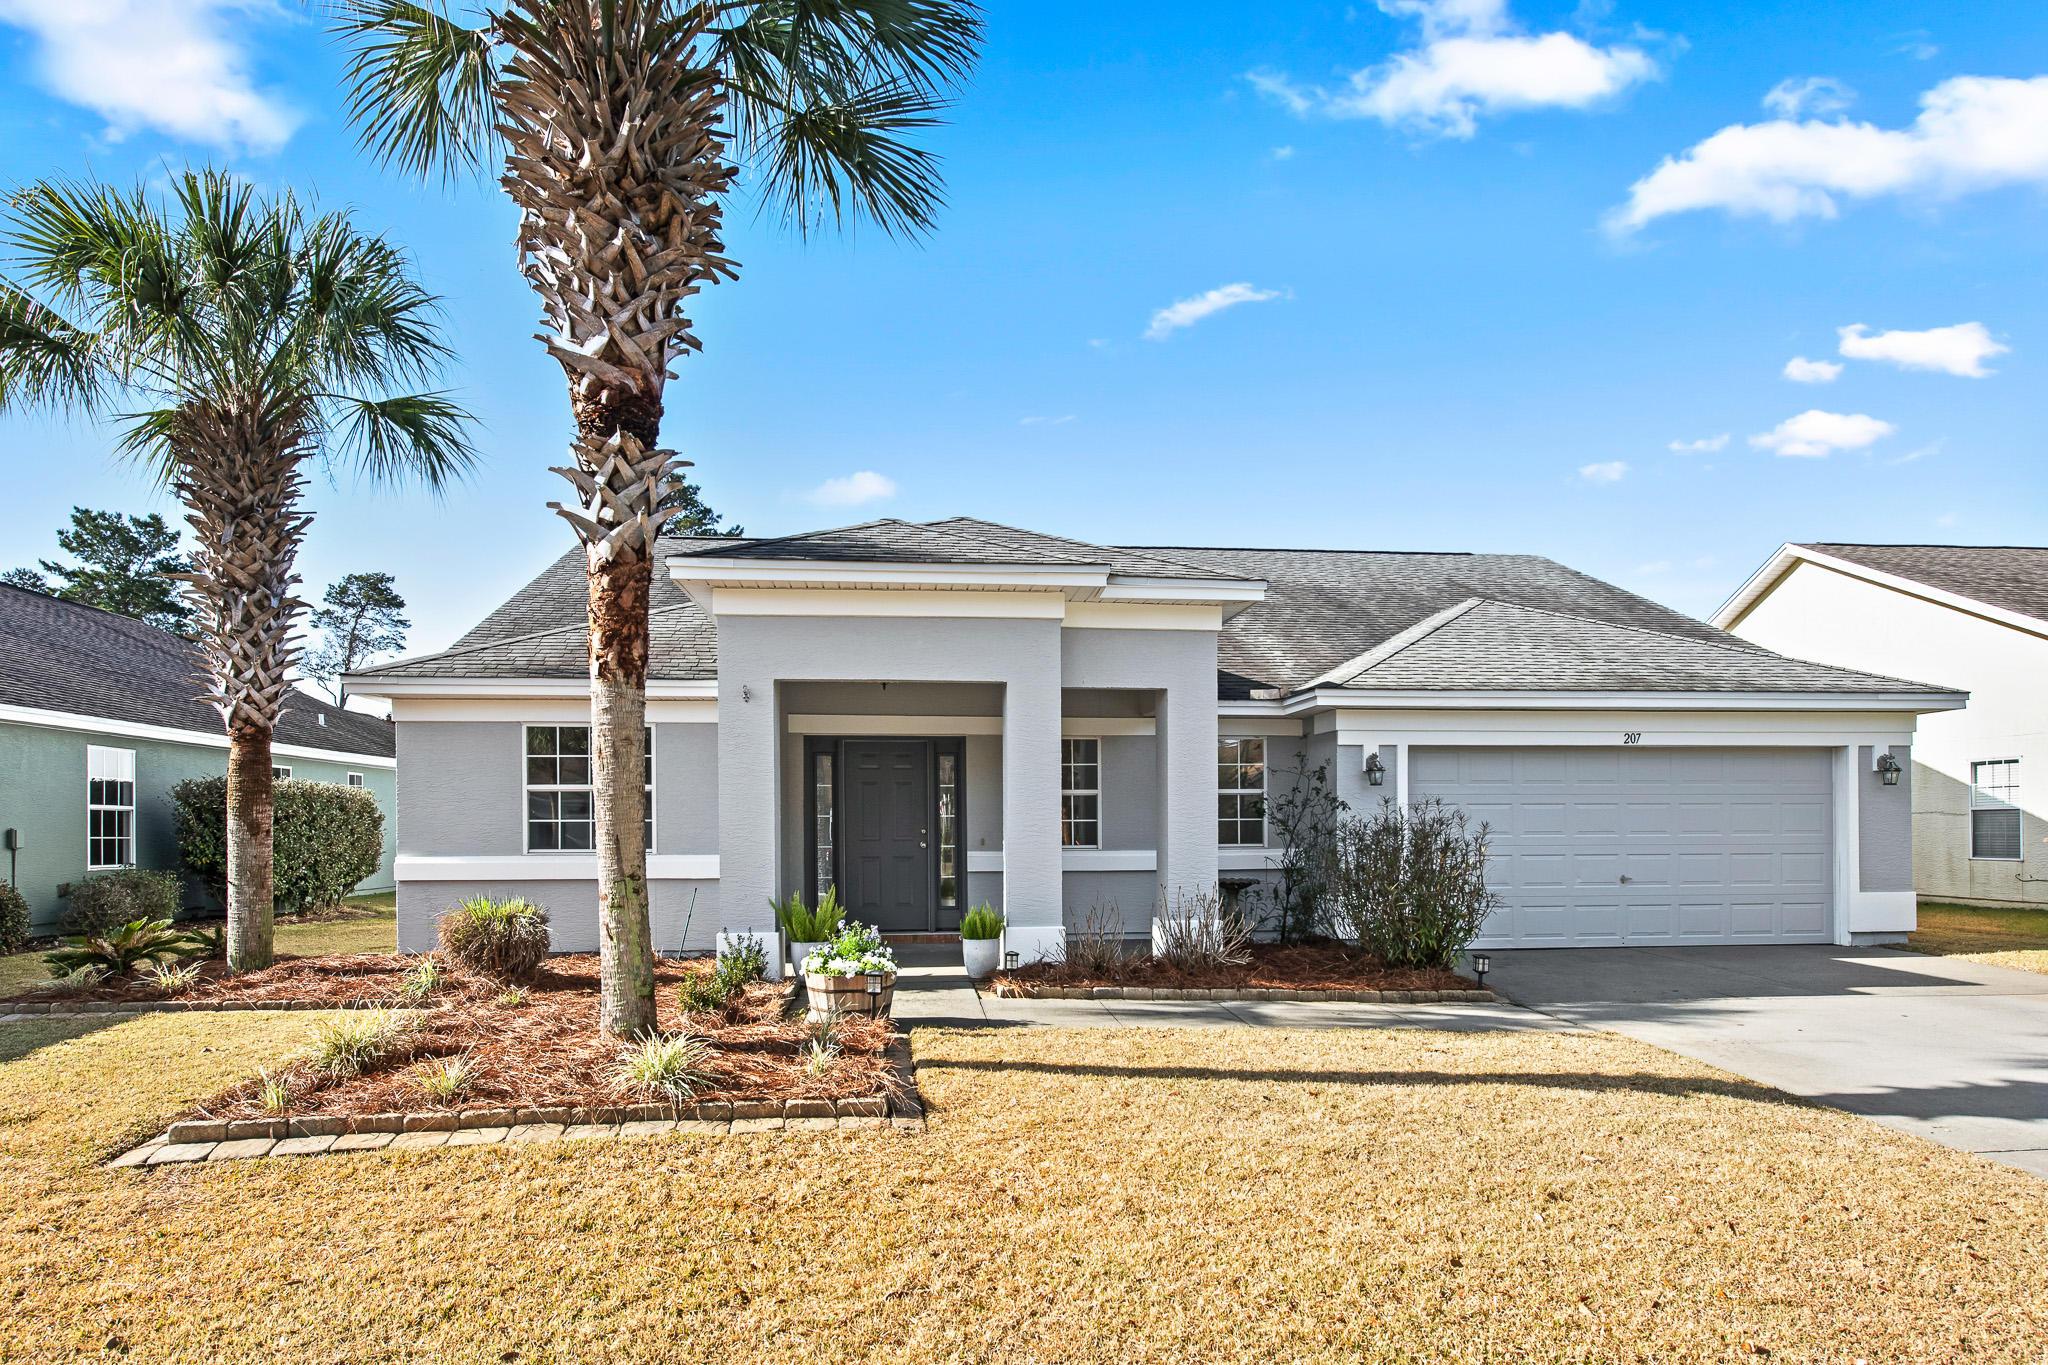 Photo of home for sale at 207 Bainbridge, Panama City Beach FL